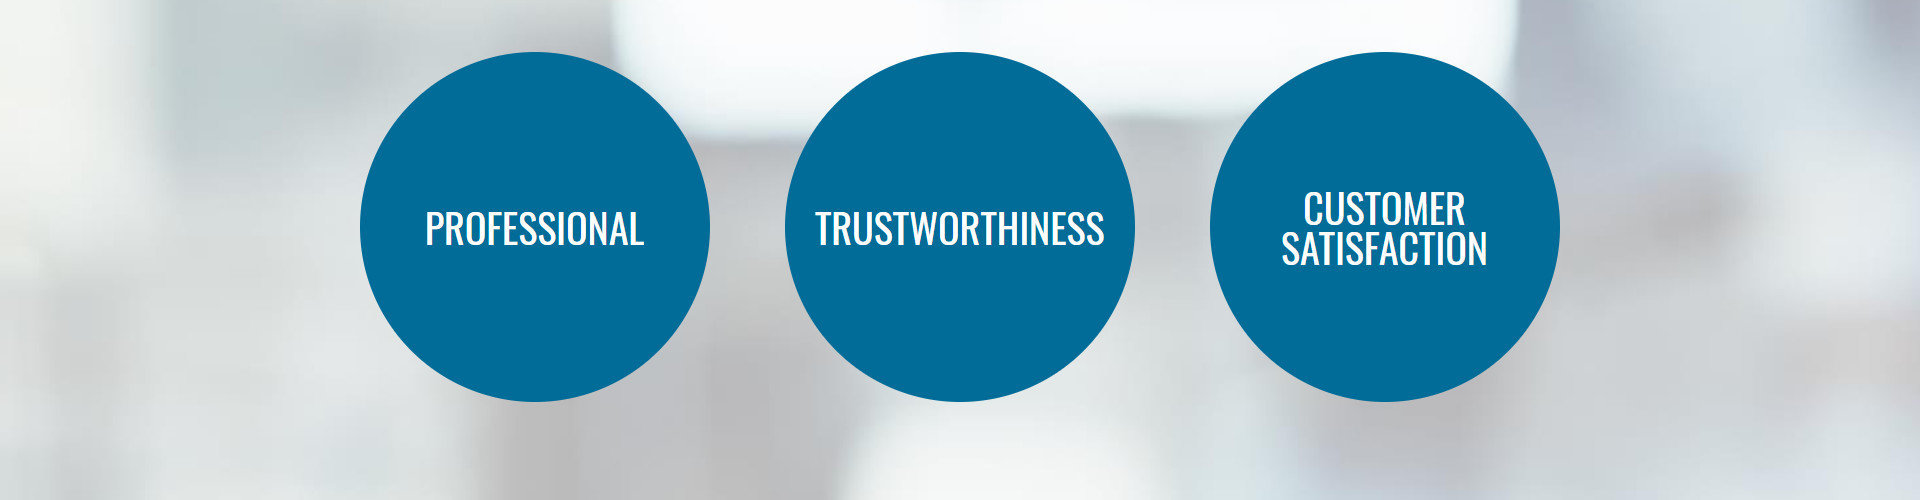 3keego's ambition - professional, trustworthiness, customer satisfaction.